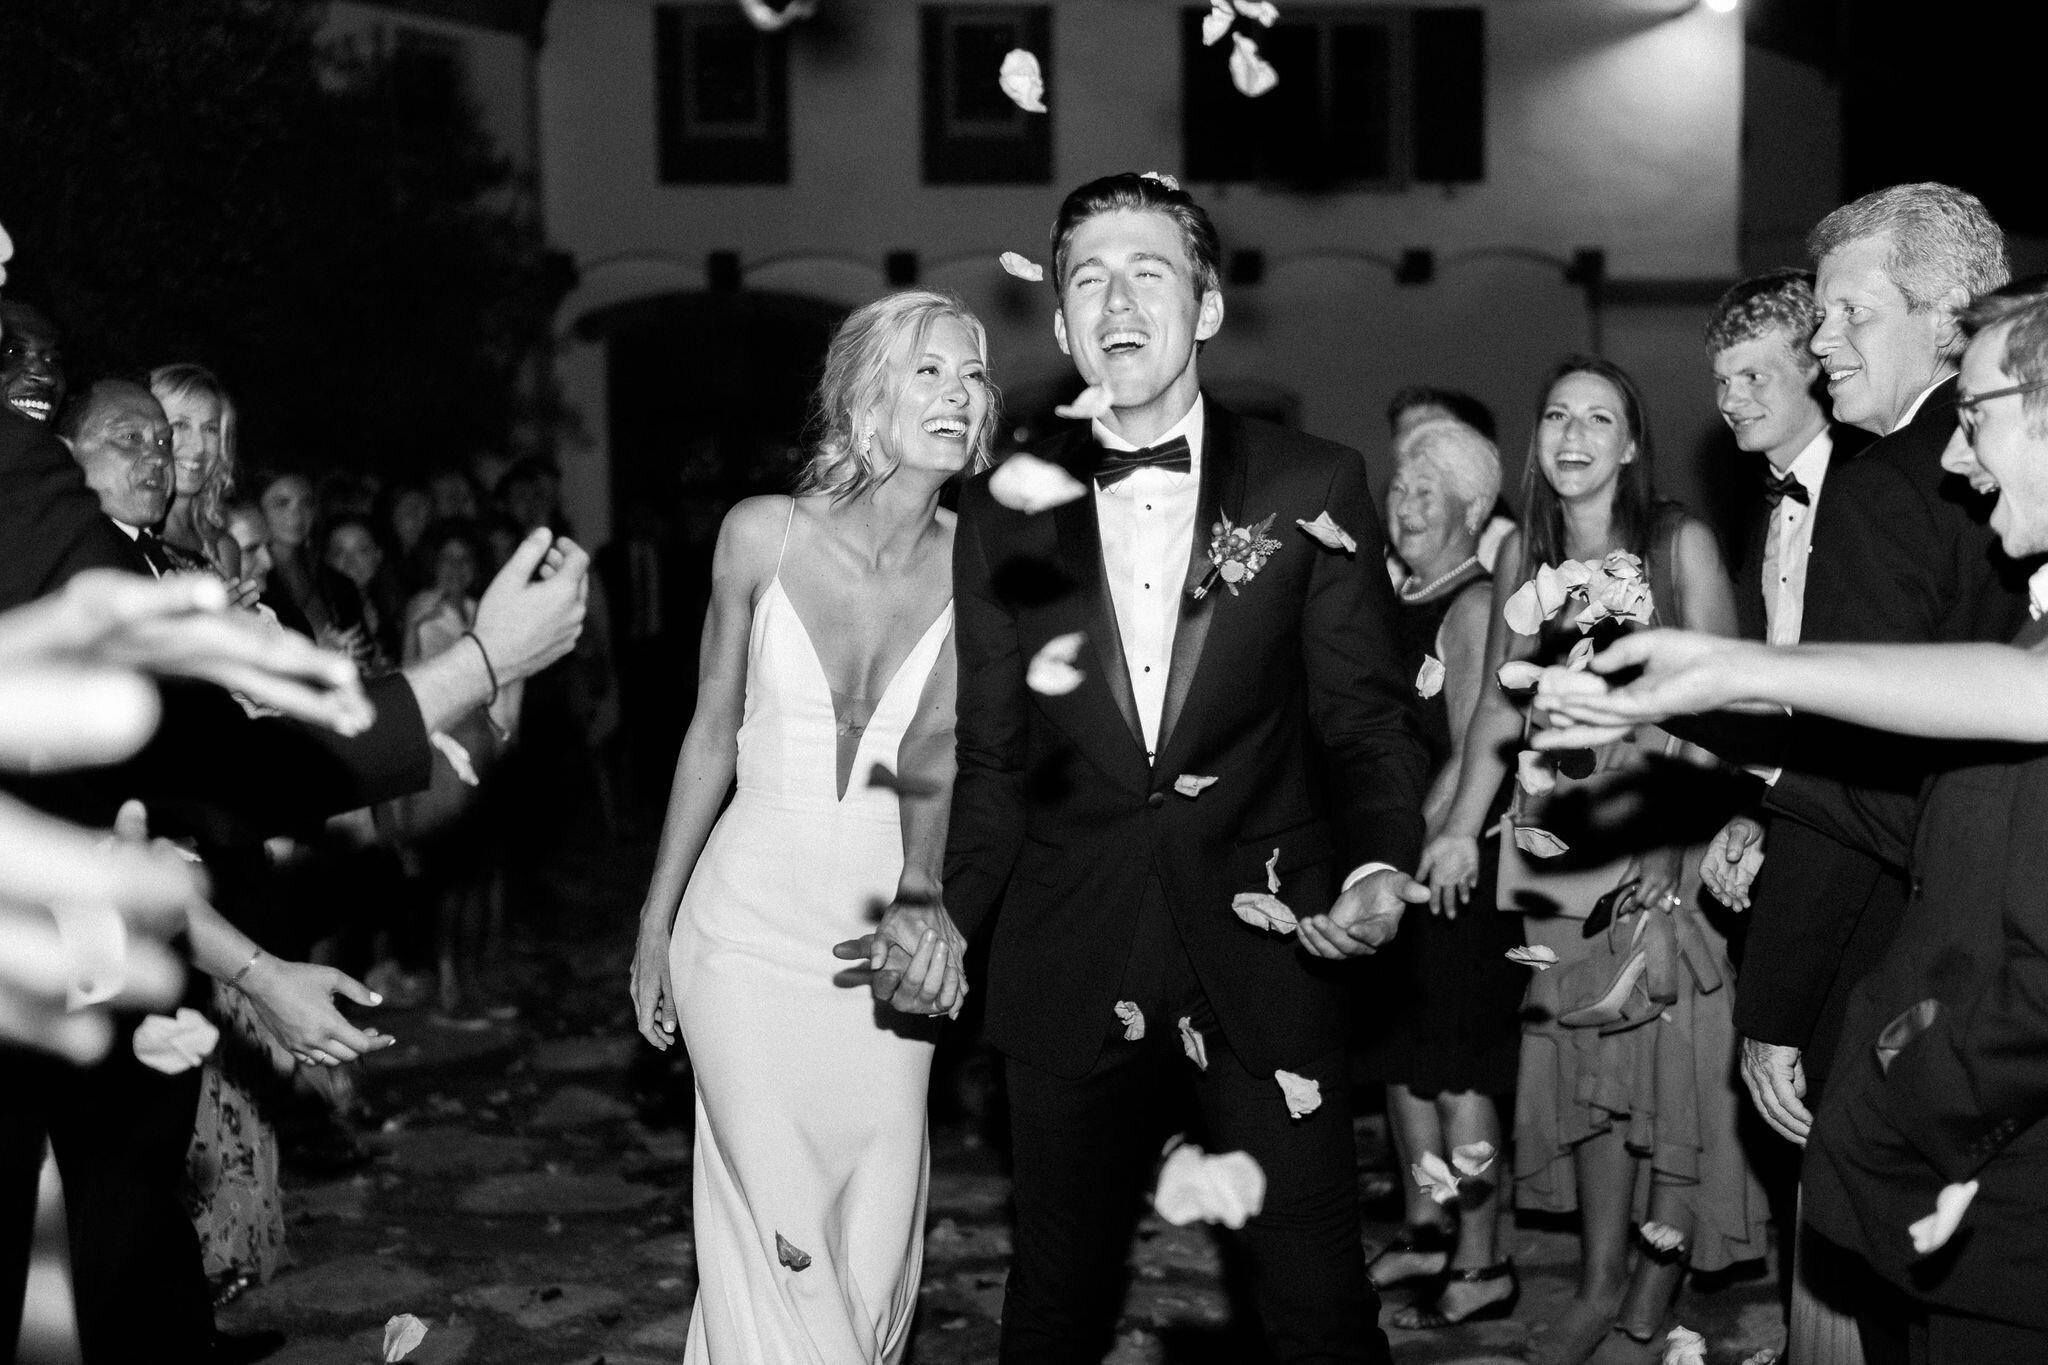 adamson-house-wedding-photography-188.jpg